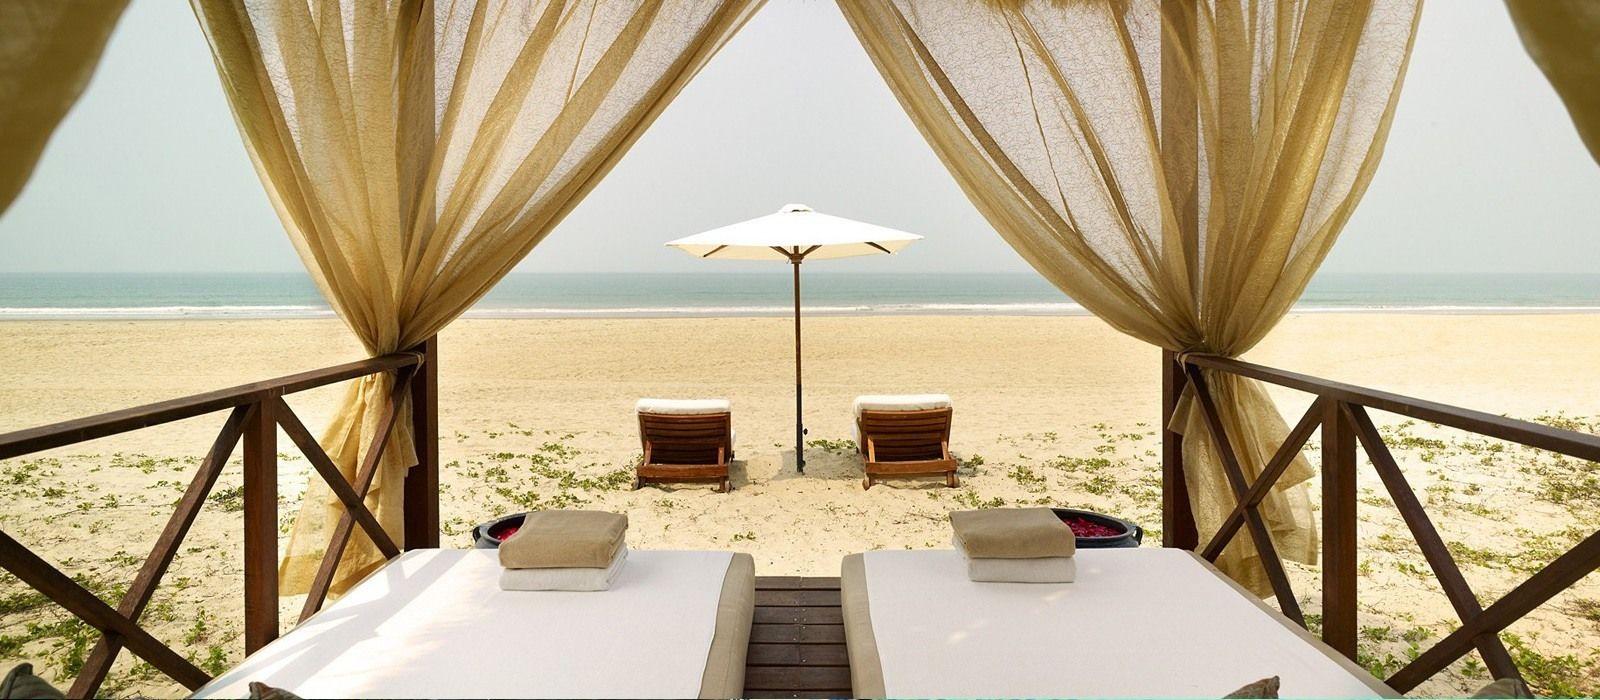 Hotel Park Hyatt Goa Resort & Spa Islands & Beaches